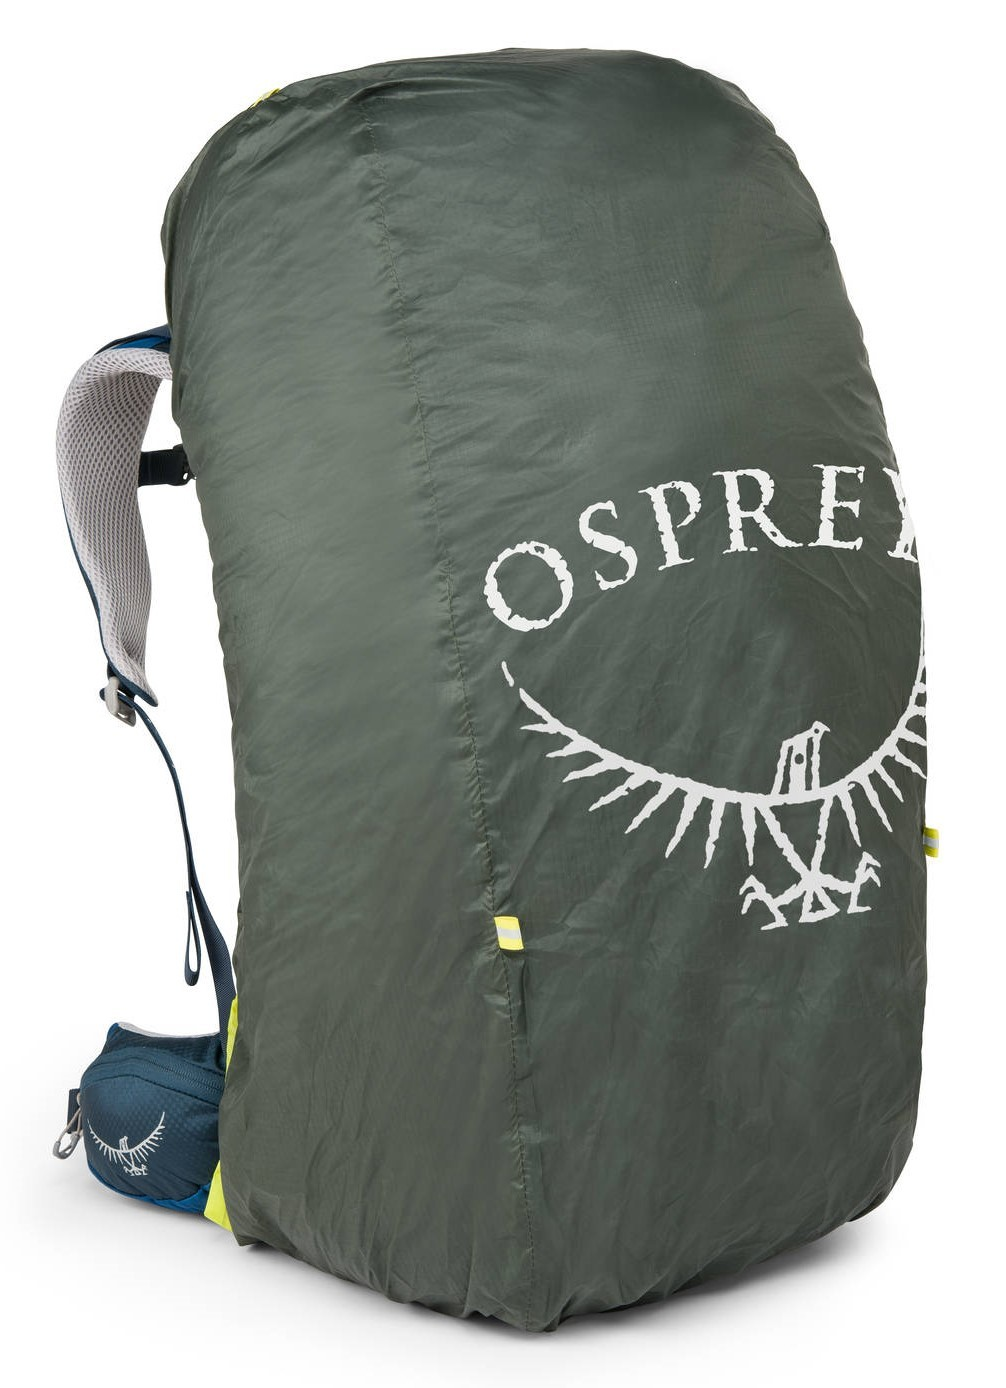 Аксессуары Чехол от дождя Osprey Ultralight Raincover M (30-50 л) UL_Raincover_Side_Shadow_Grey_web.jpg